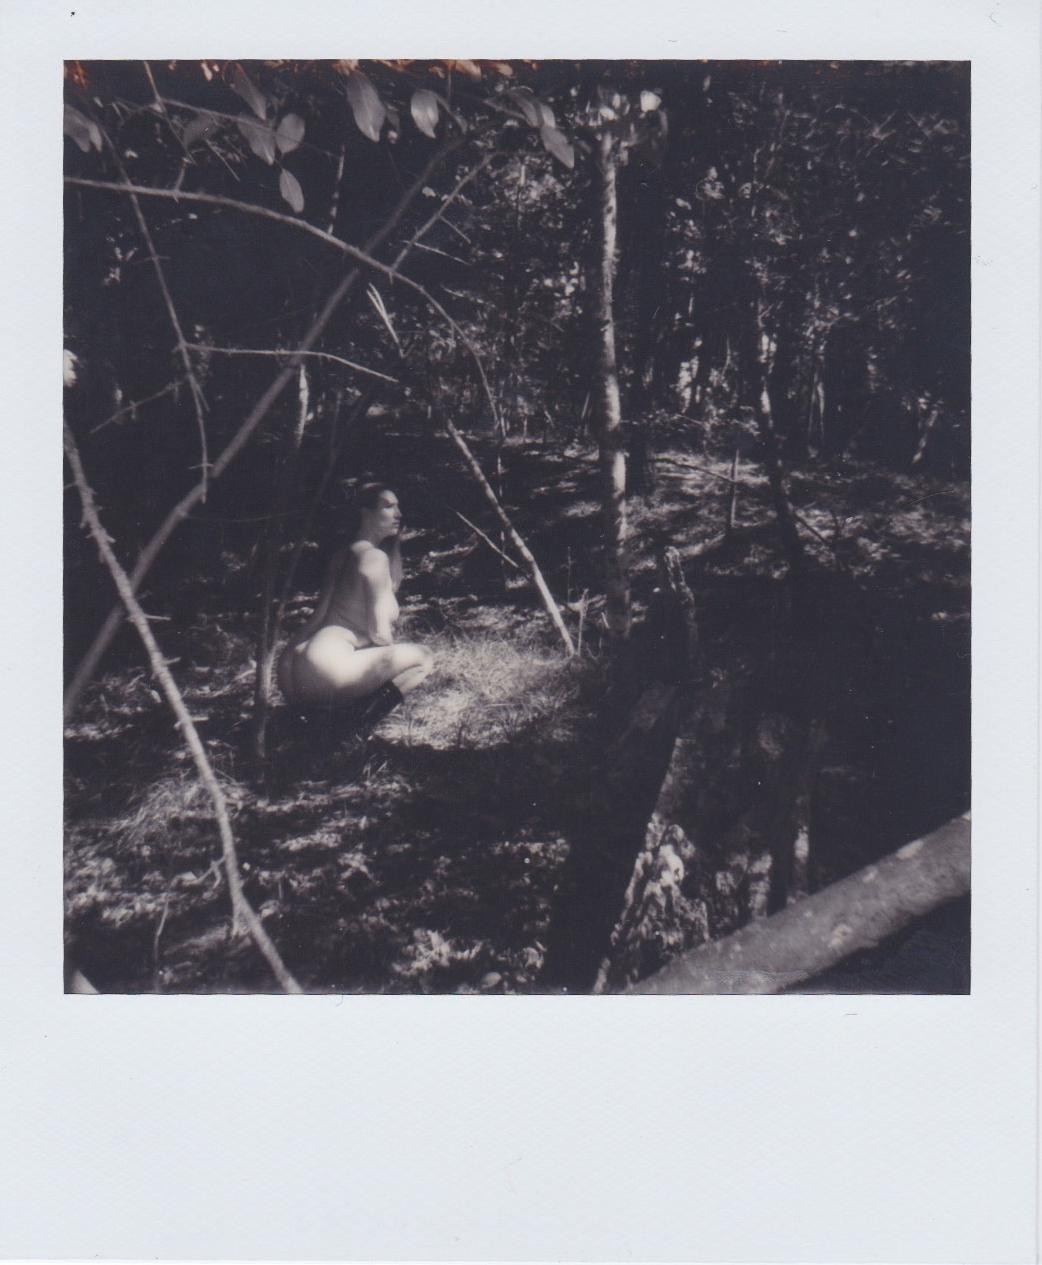 Polaroid project Day 3-1 by JW Purdy